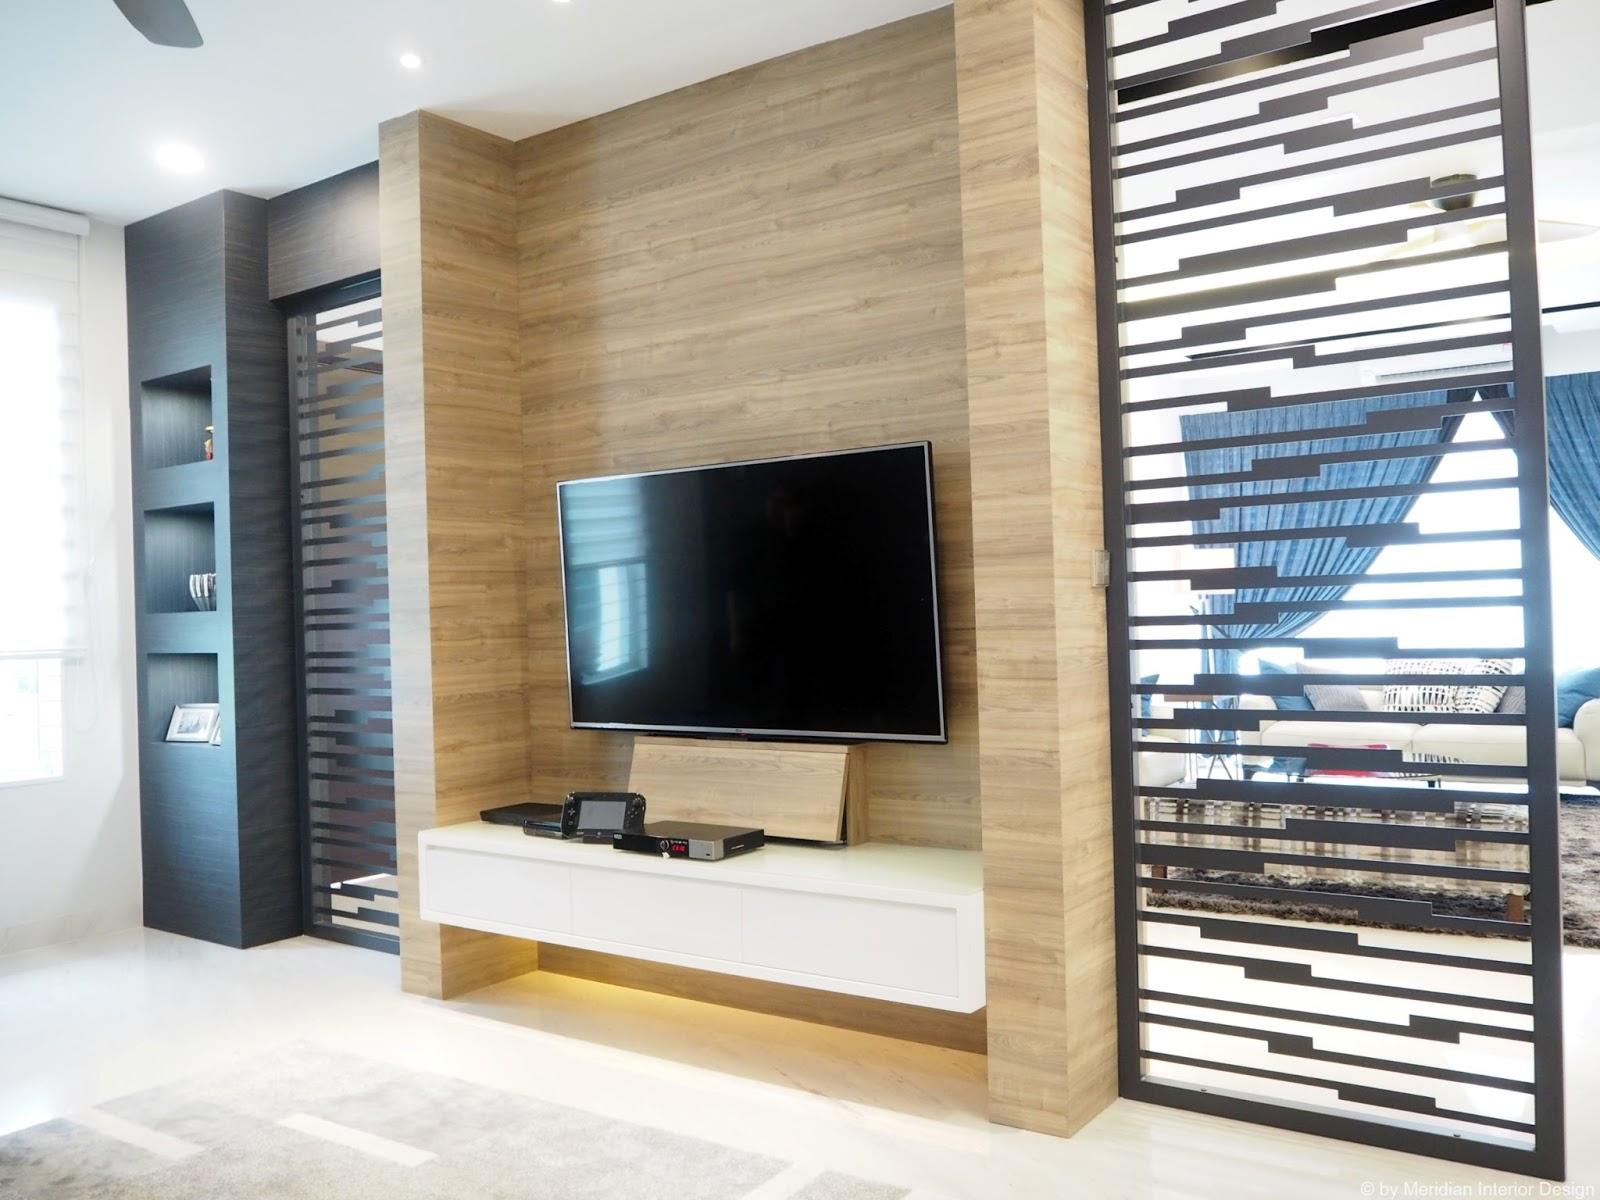 Meridian Interior Design and Kitchen Design in Kuala  : TV2BConsole2B252C2BMetal2BWall2BPanel from meridianinteriordesign.blogspot.com size 1600 x 1200 jpeg 247kB